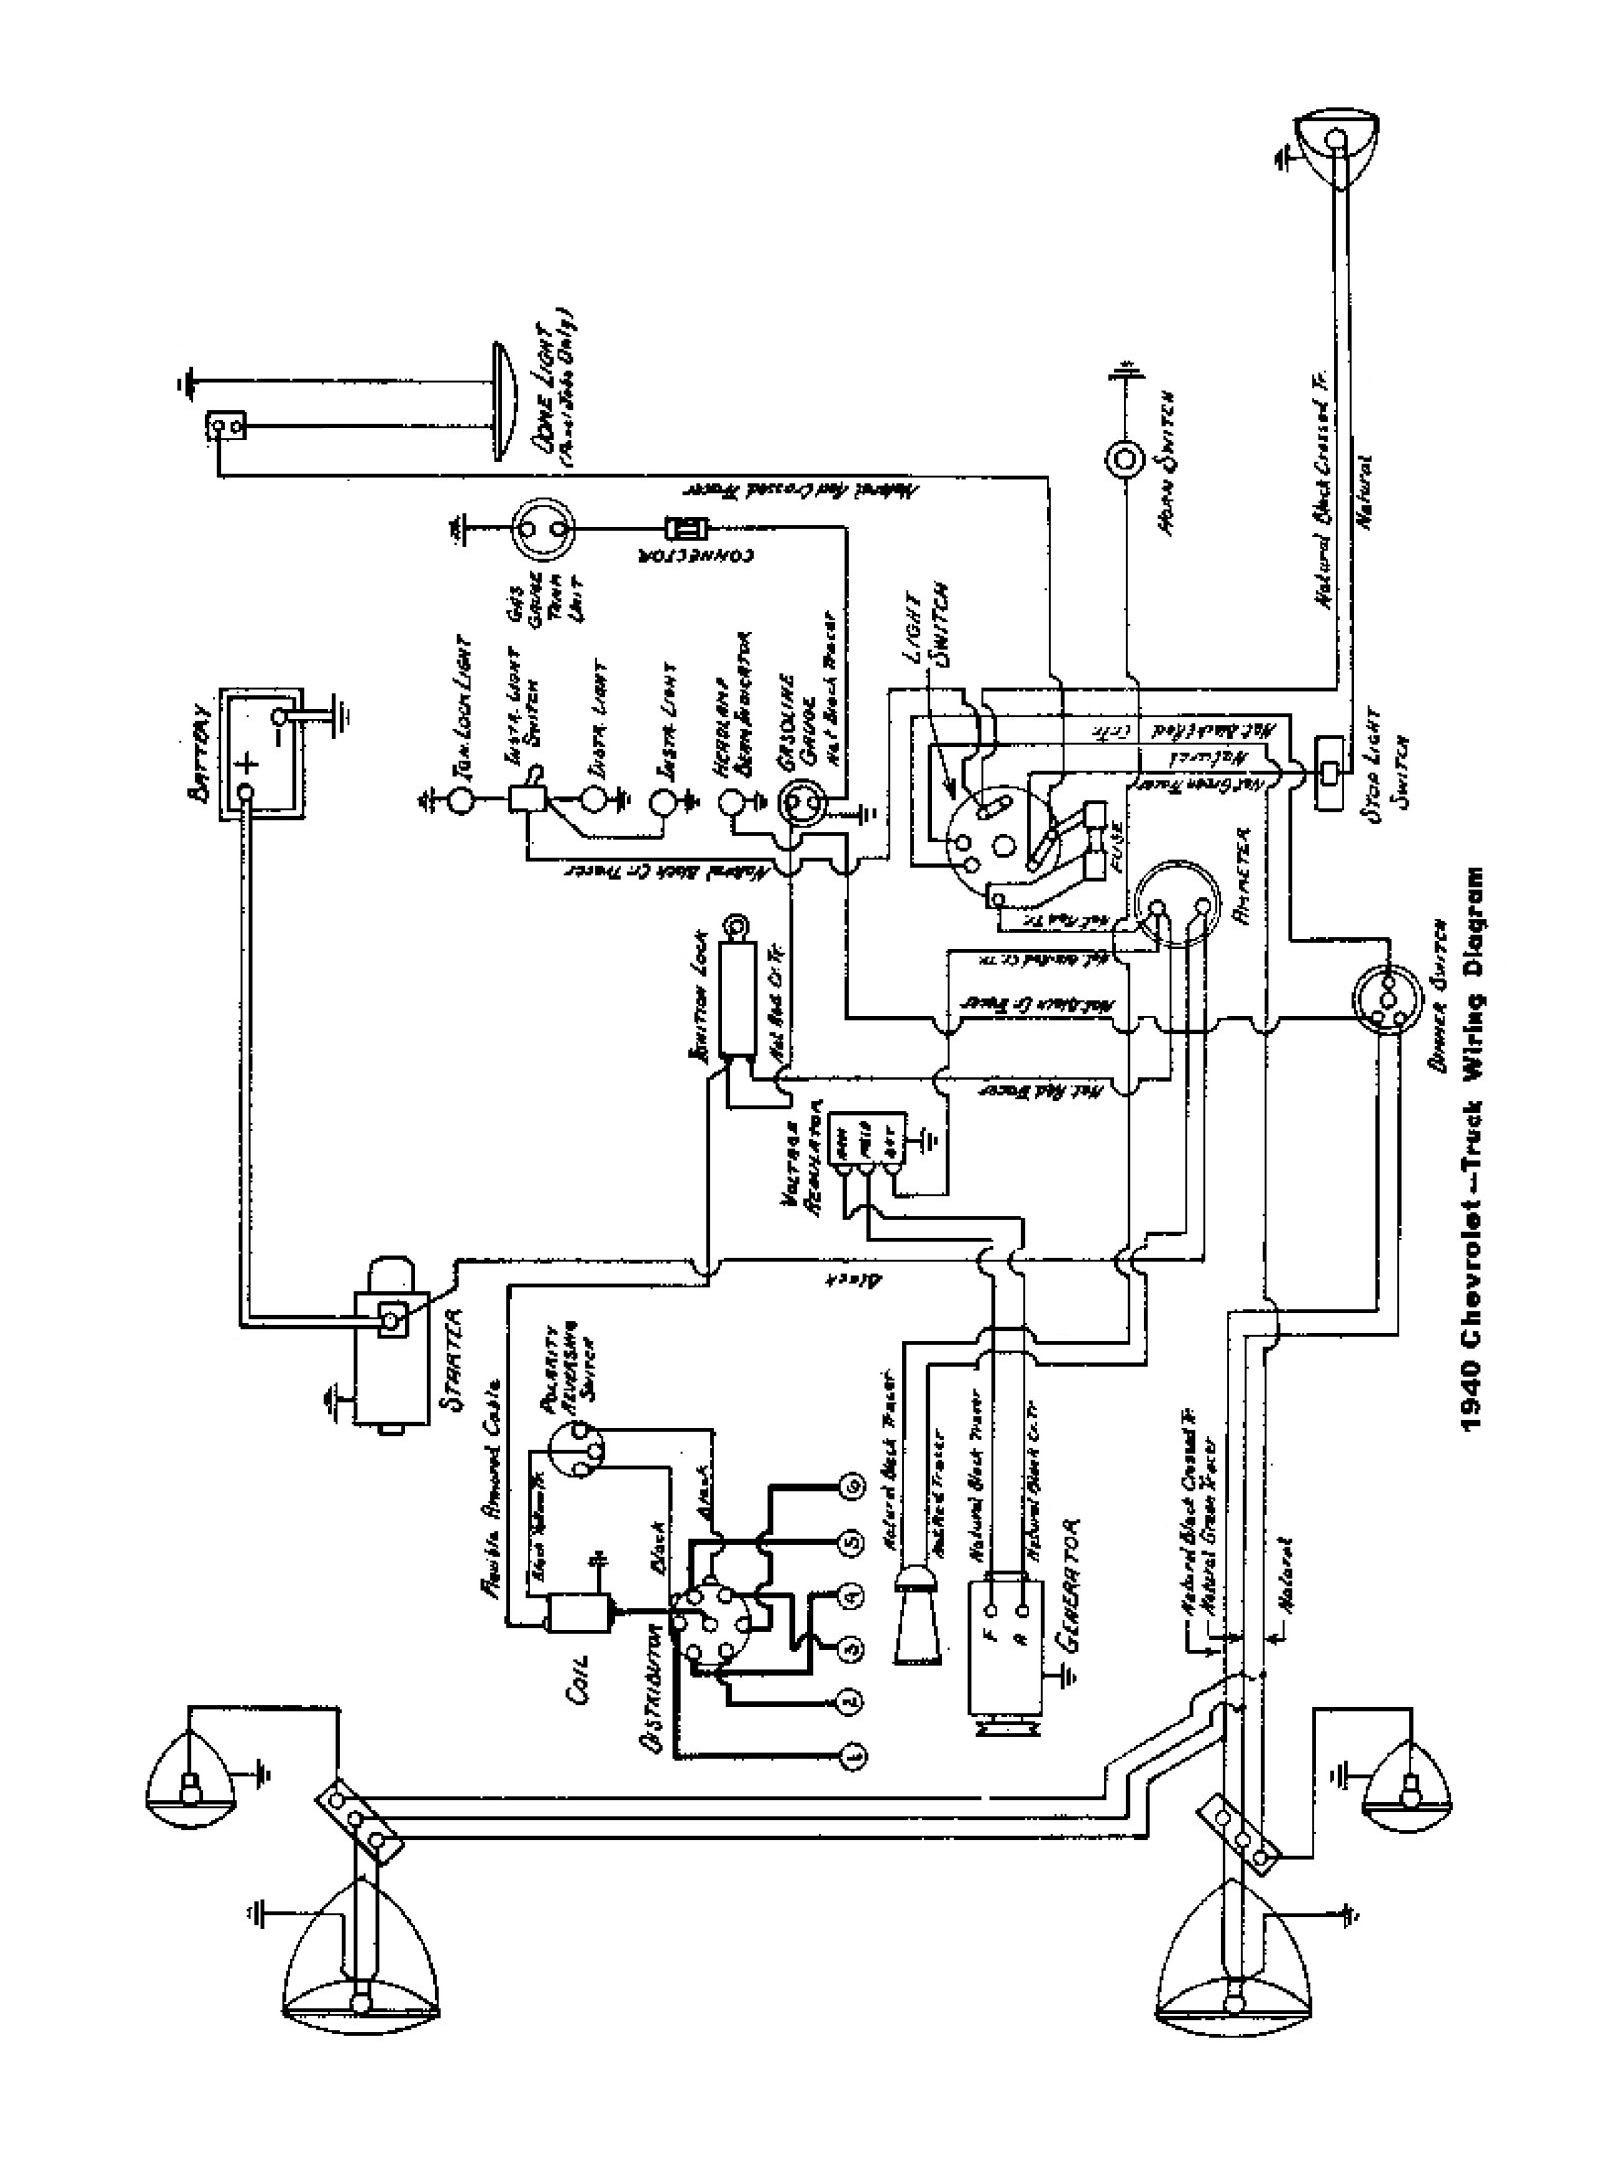 Chevy Silverado Parts Diagram Chevy Wiring Diagrams Of Chevy Silverado Parts Diagram Suburban Parts Diagram Besides Gm Bulkhead Connector Wiring Diagram